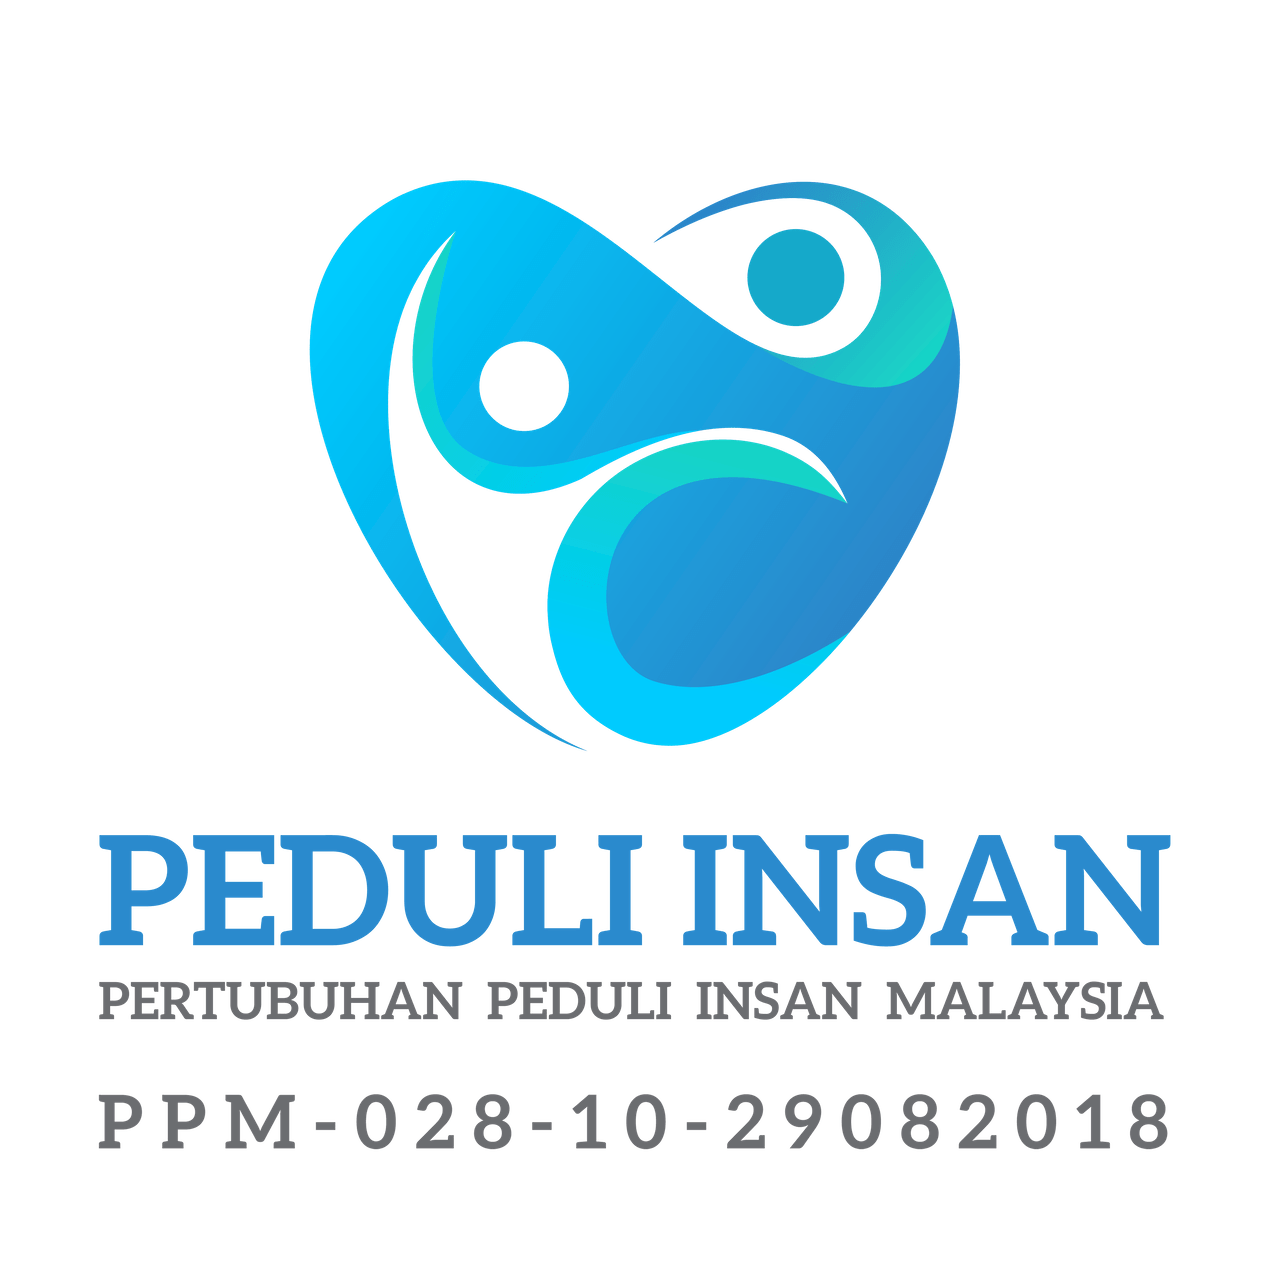 Peduliinsan logo